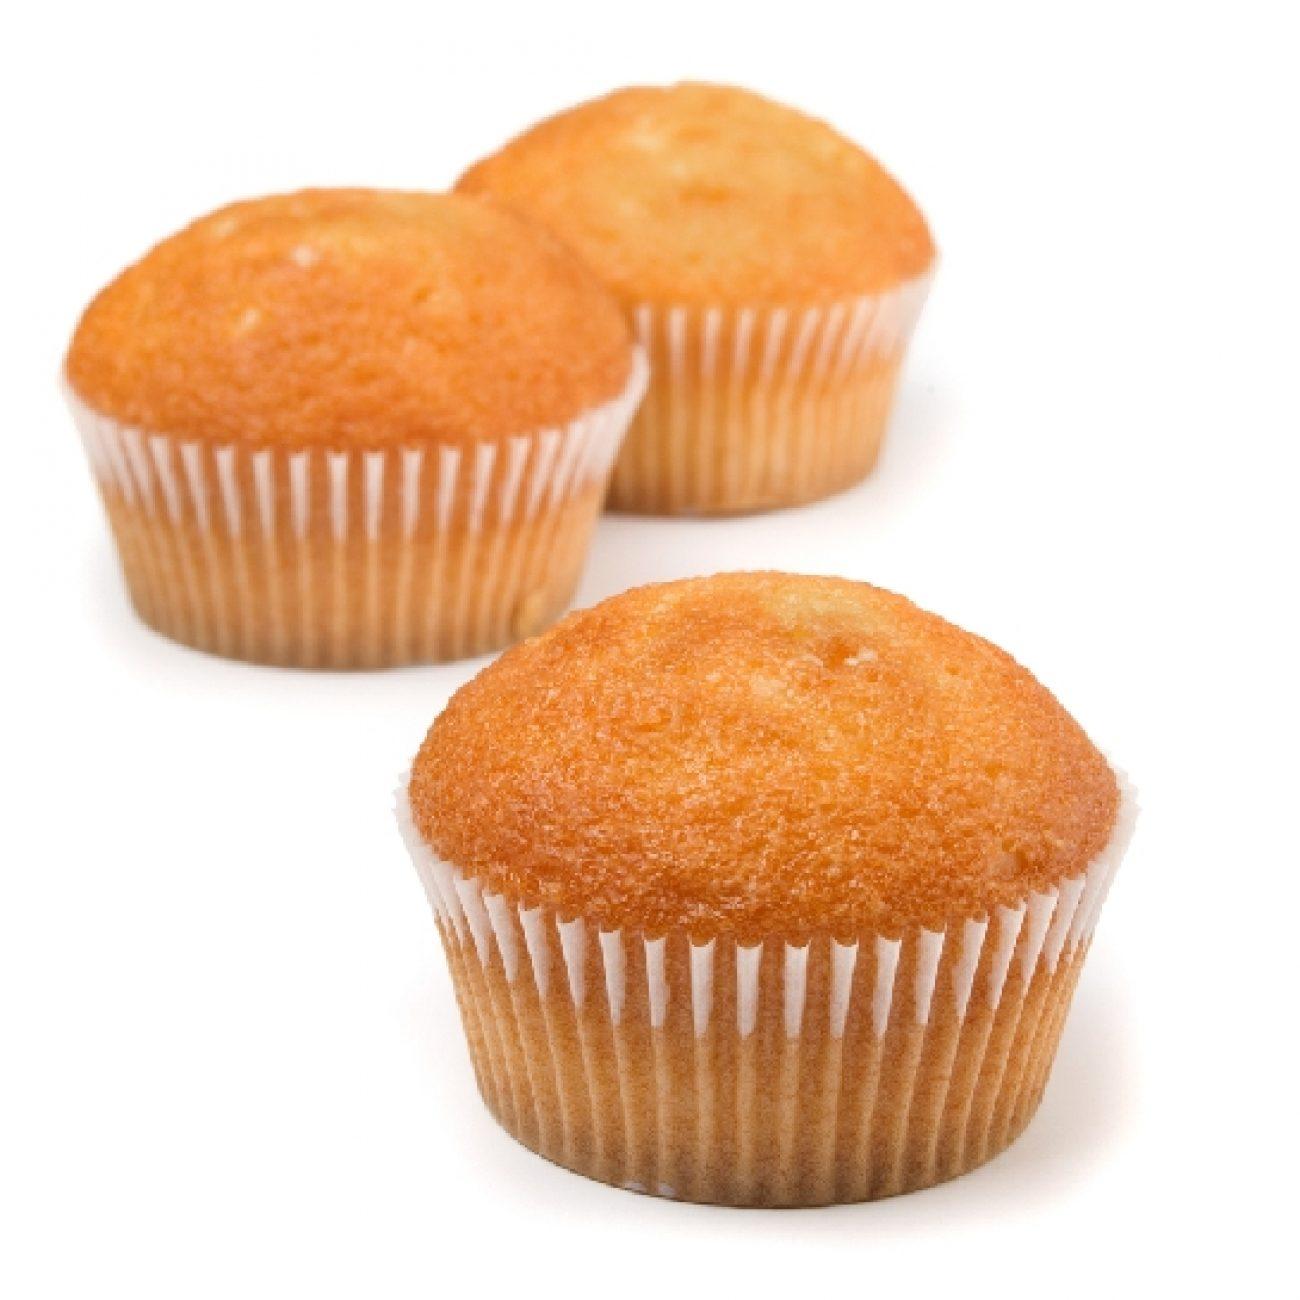 Gyömbéres-zöldcitromos muffin